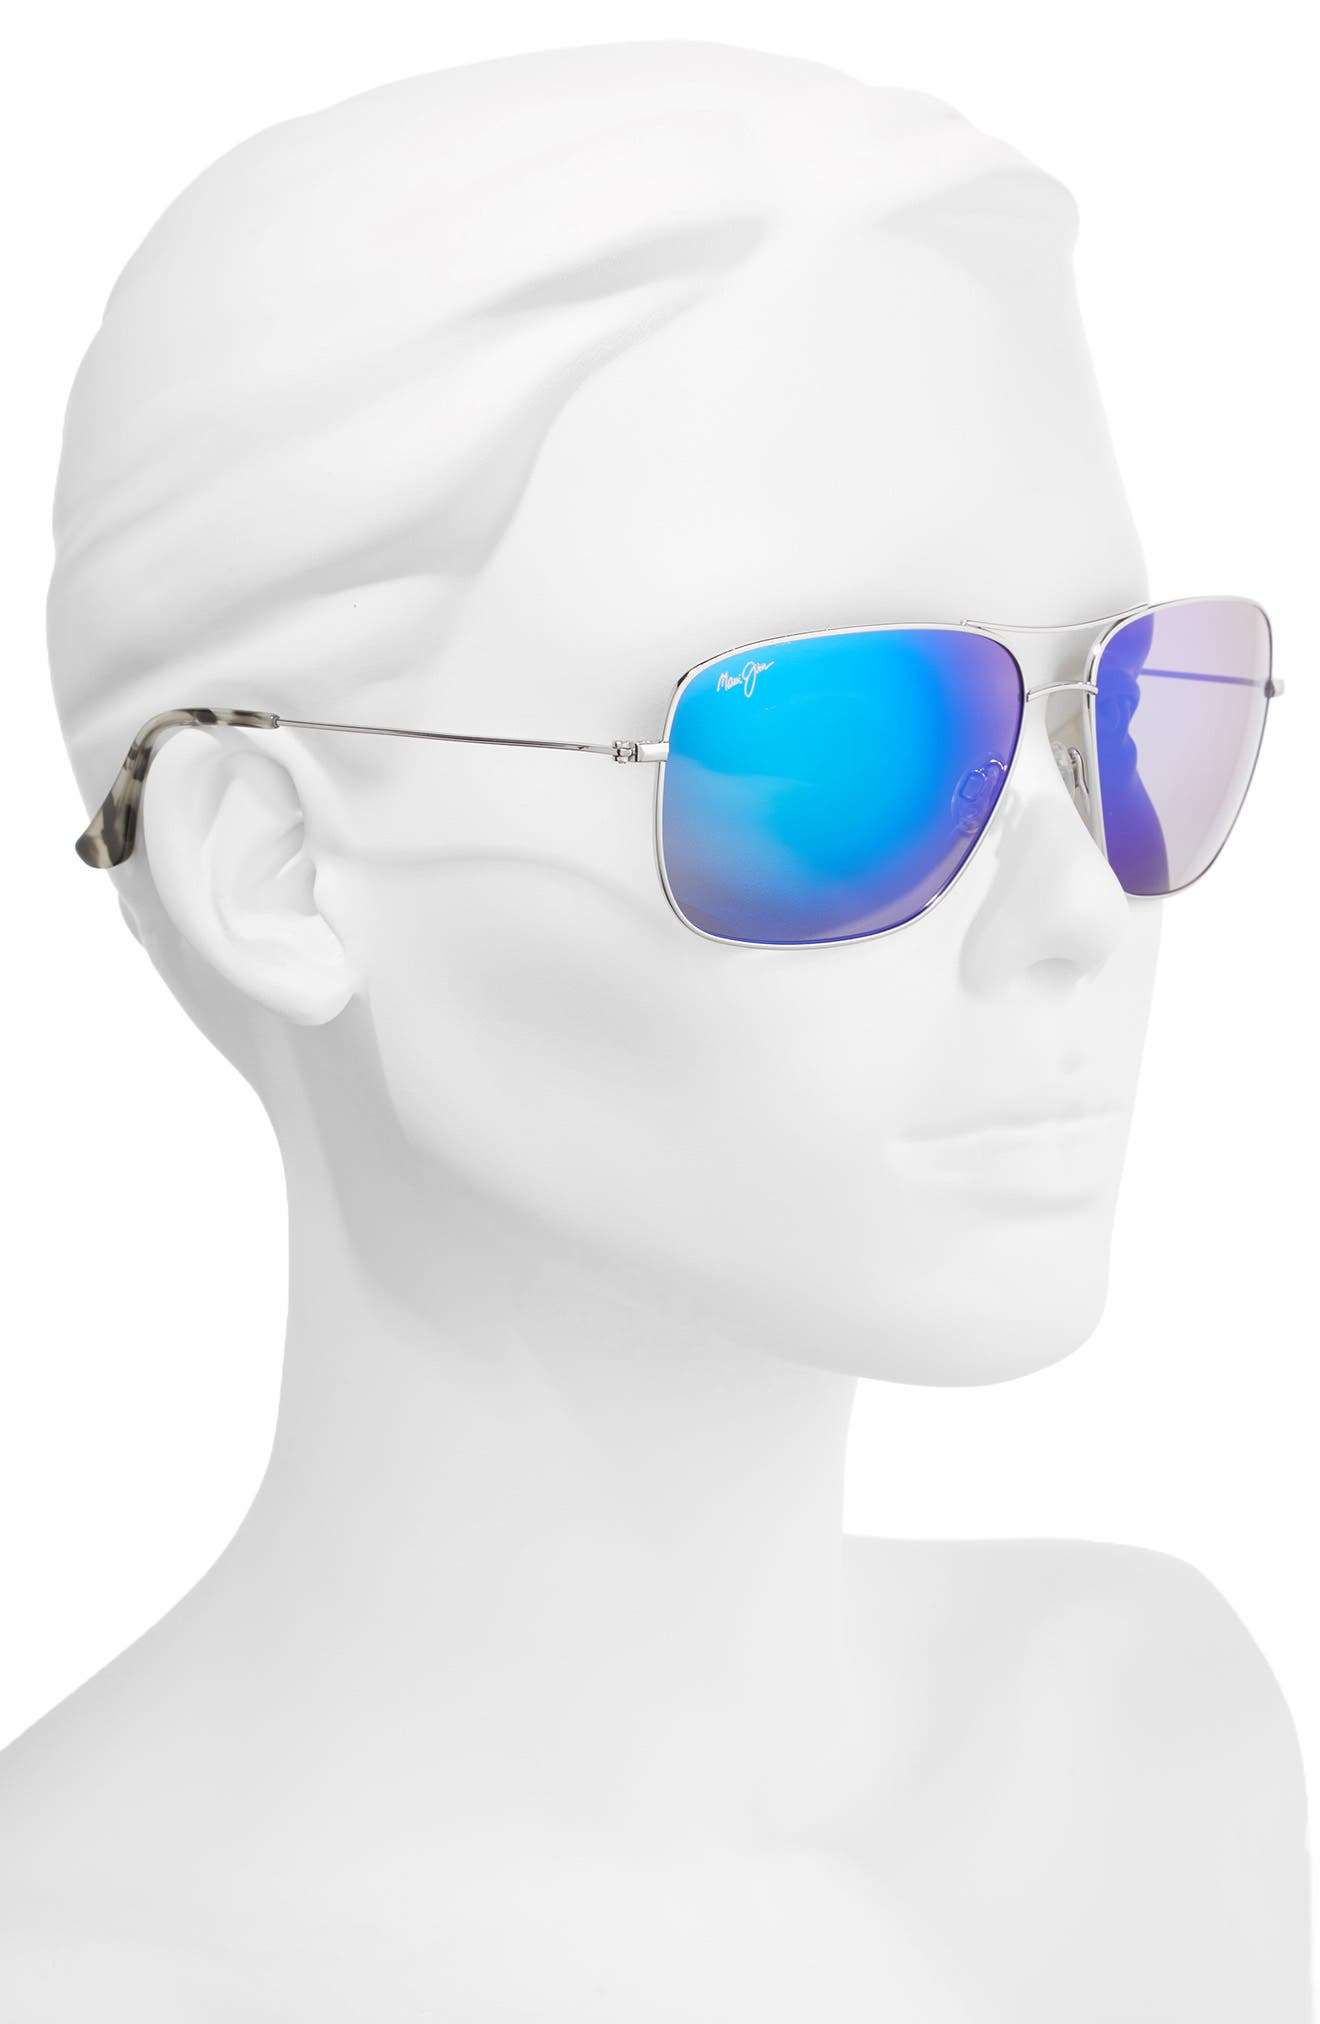 Cook Pines 63mm Polarized Titanium Aviator Sunglasses,                             Alternate thumbnail 2, color,                             040